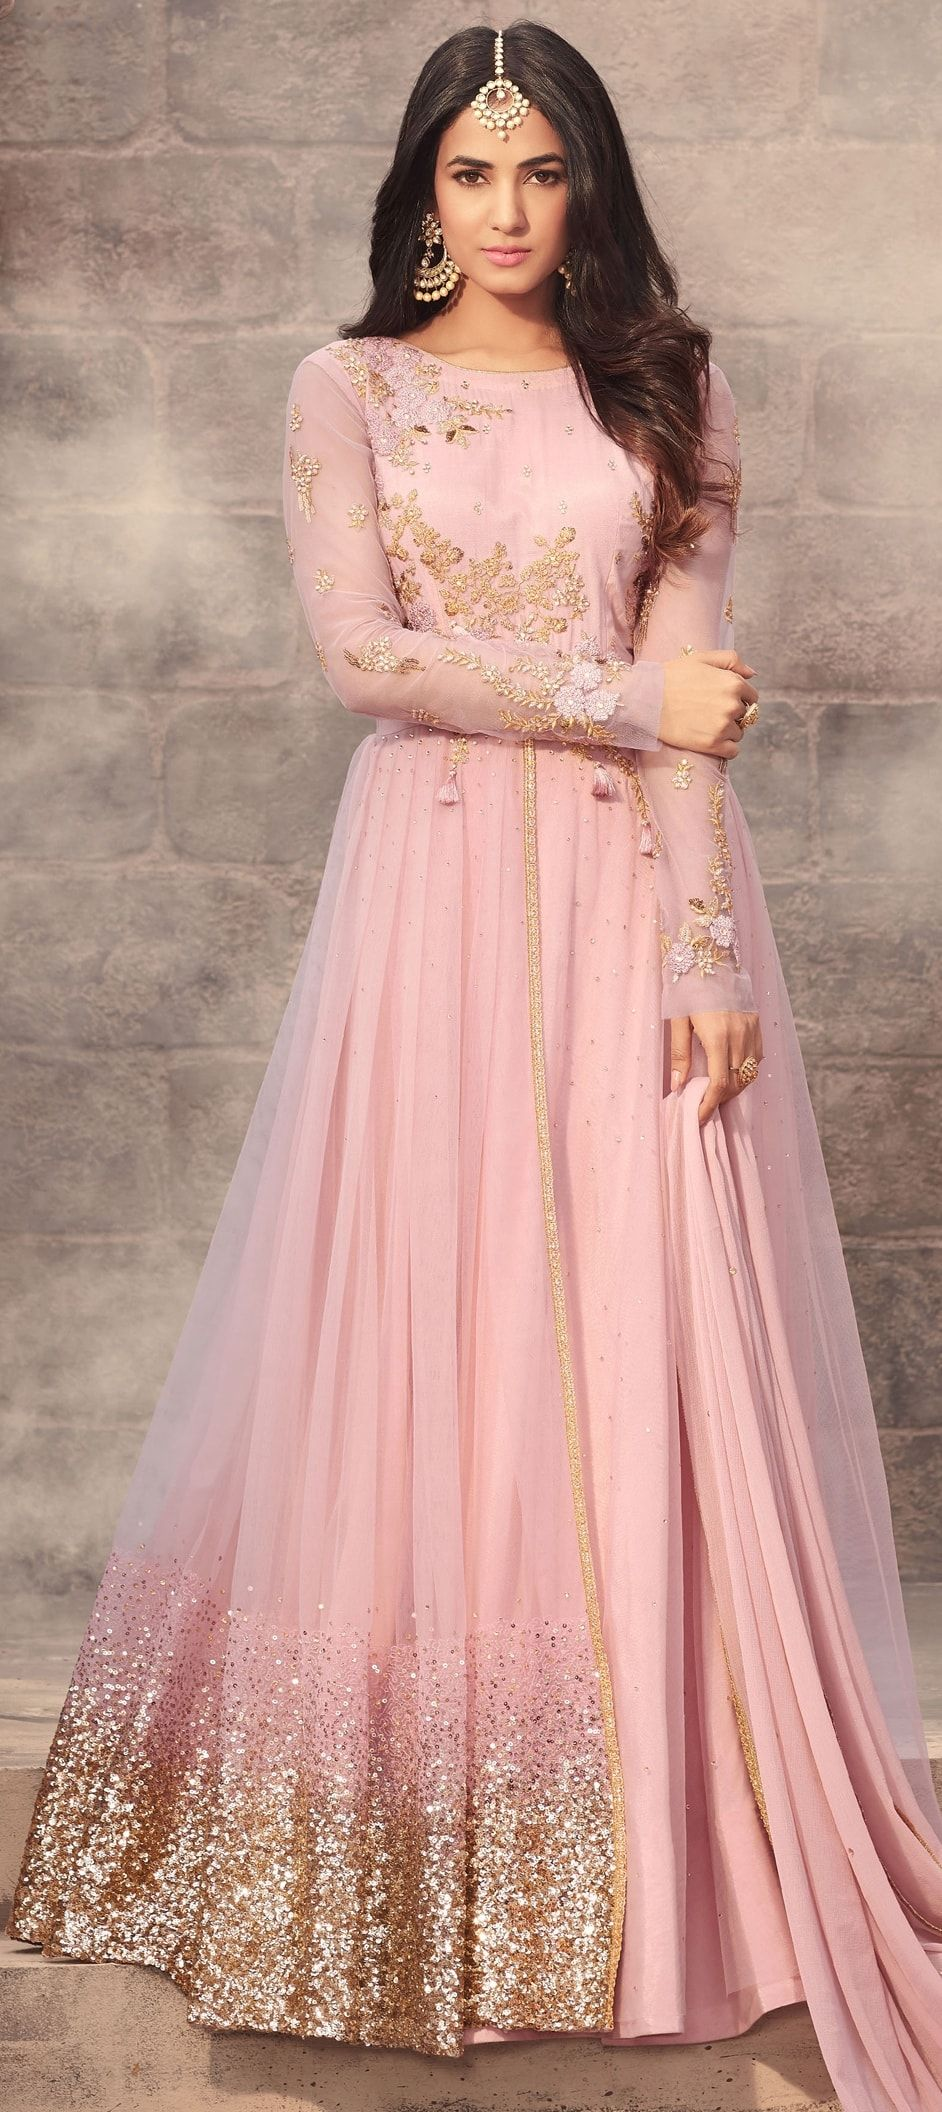 Zi Ran Rai Sweetheart Wedding Dresses for Bride 2018 Long Sleeveless Princess Lace Applique Wedding Bridal Gowns